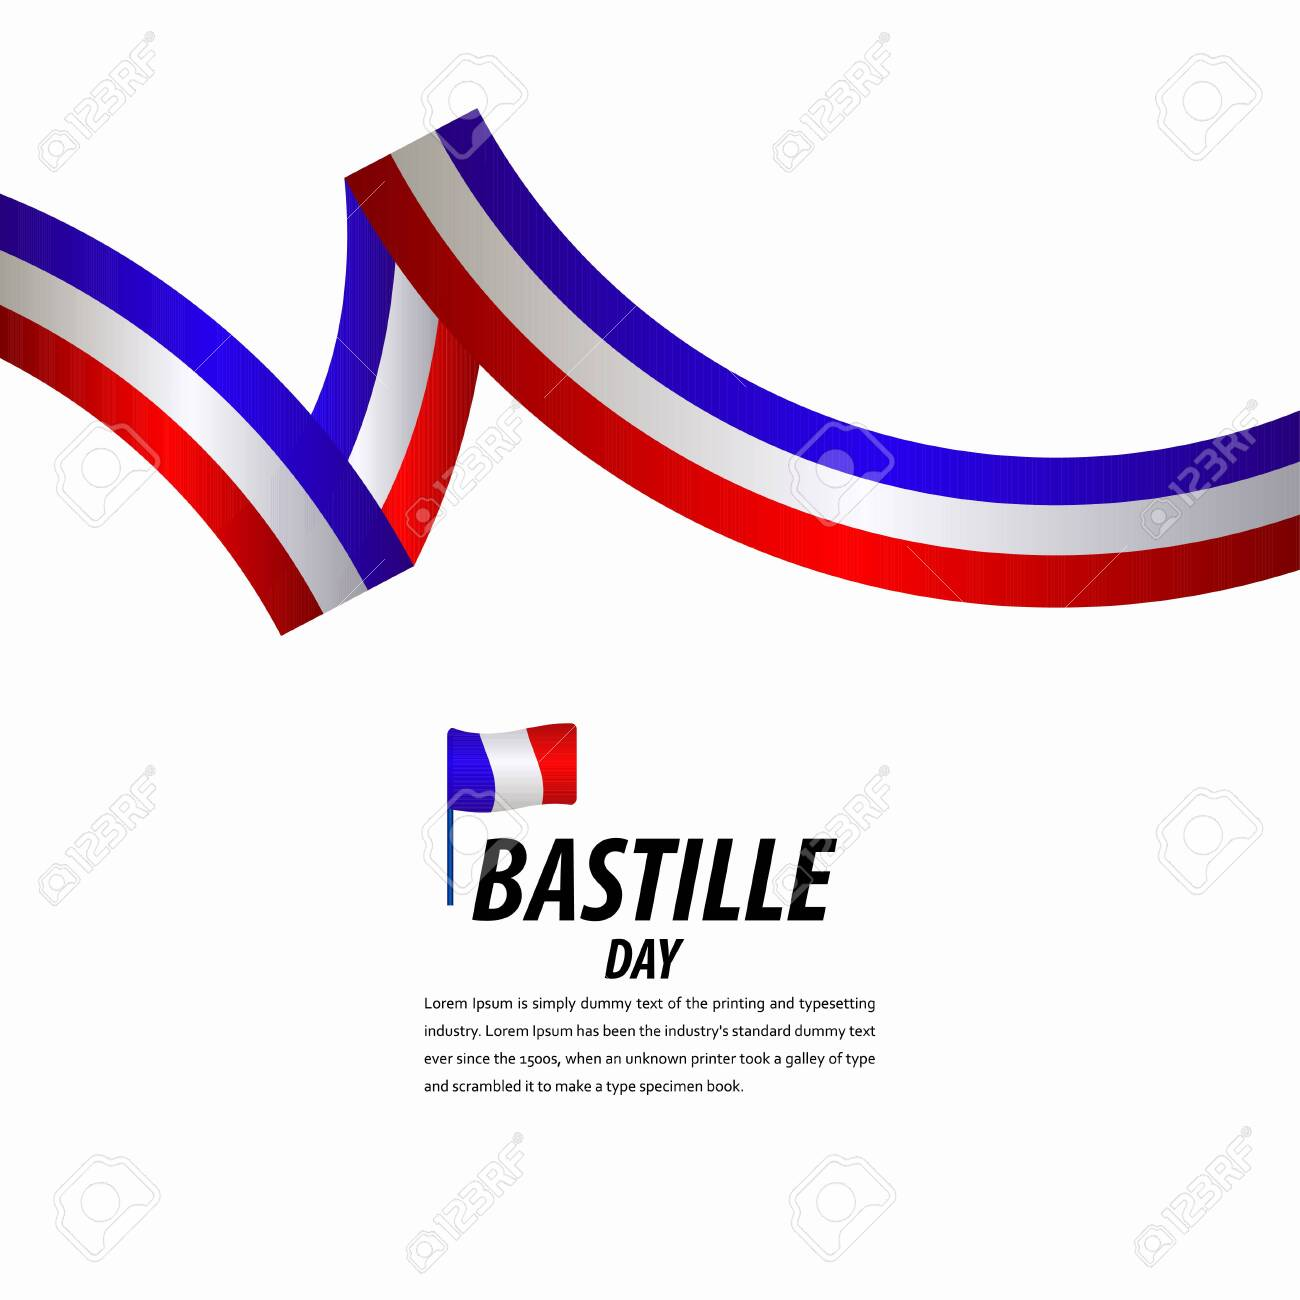 Happy Bastille Day Celebration, Poster, Ribbon banner vector template design illustration - 137399117